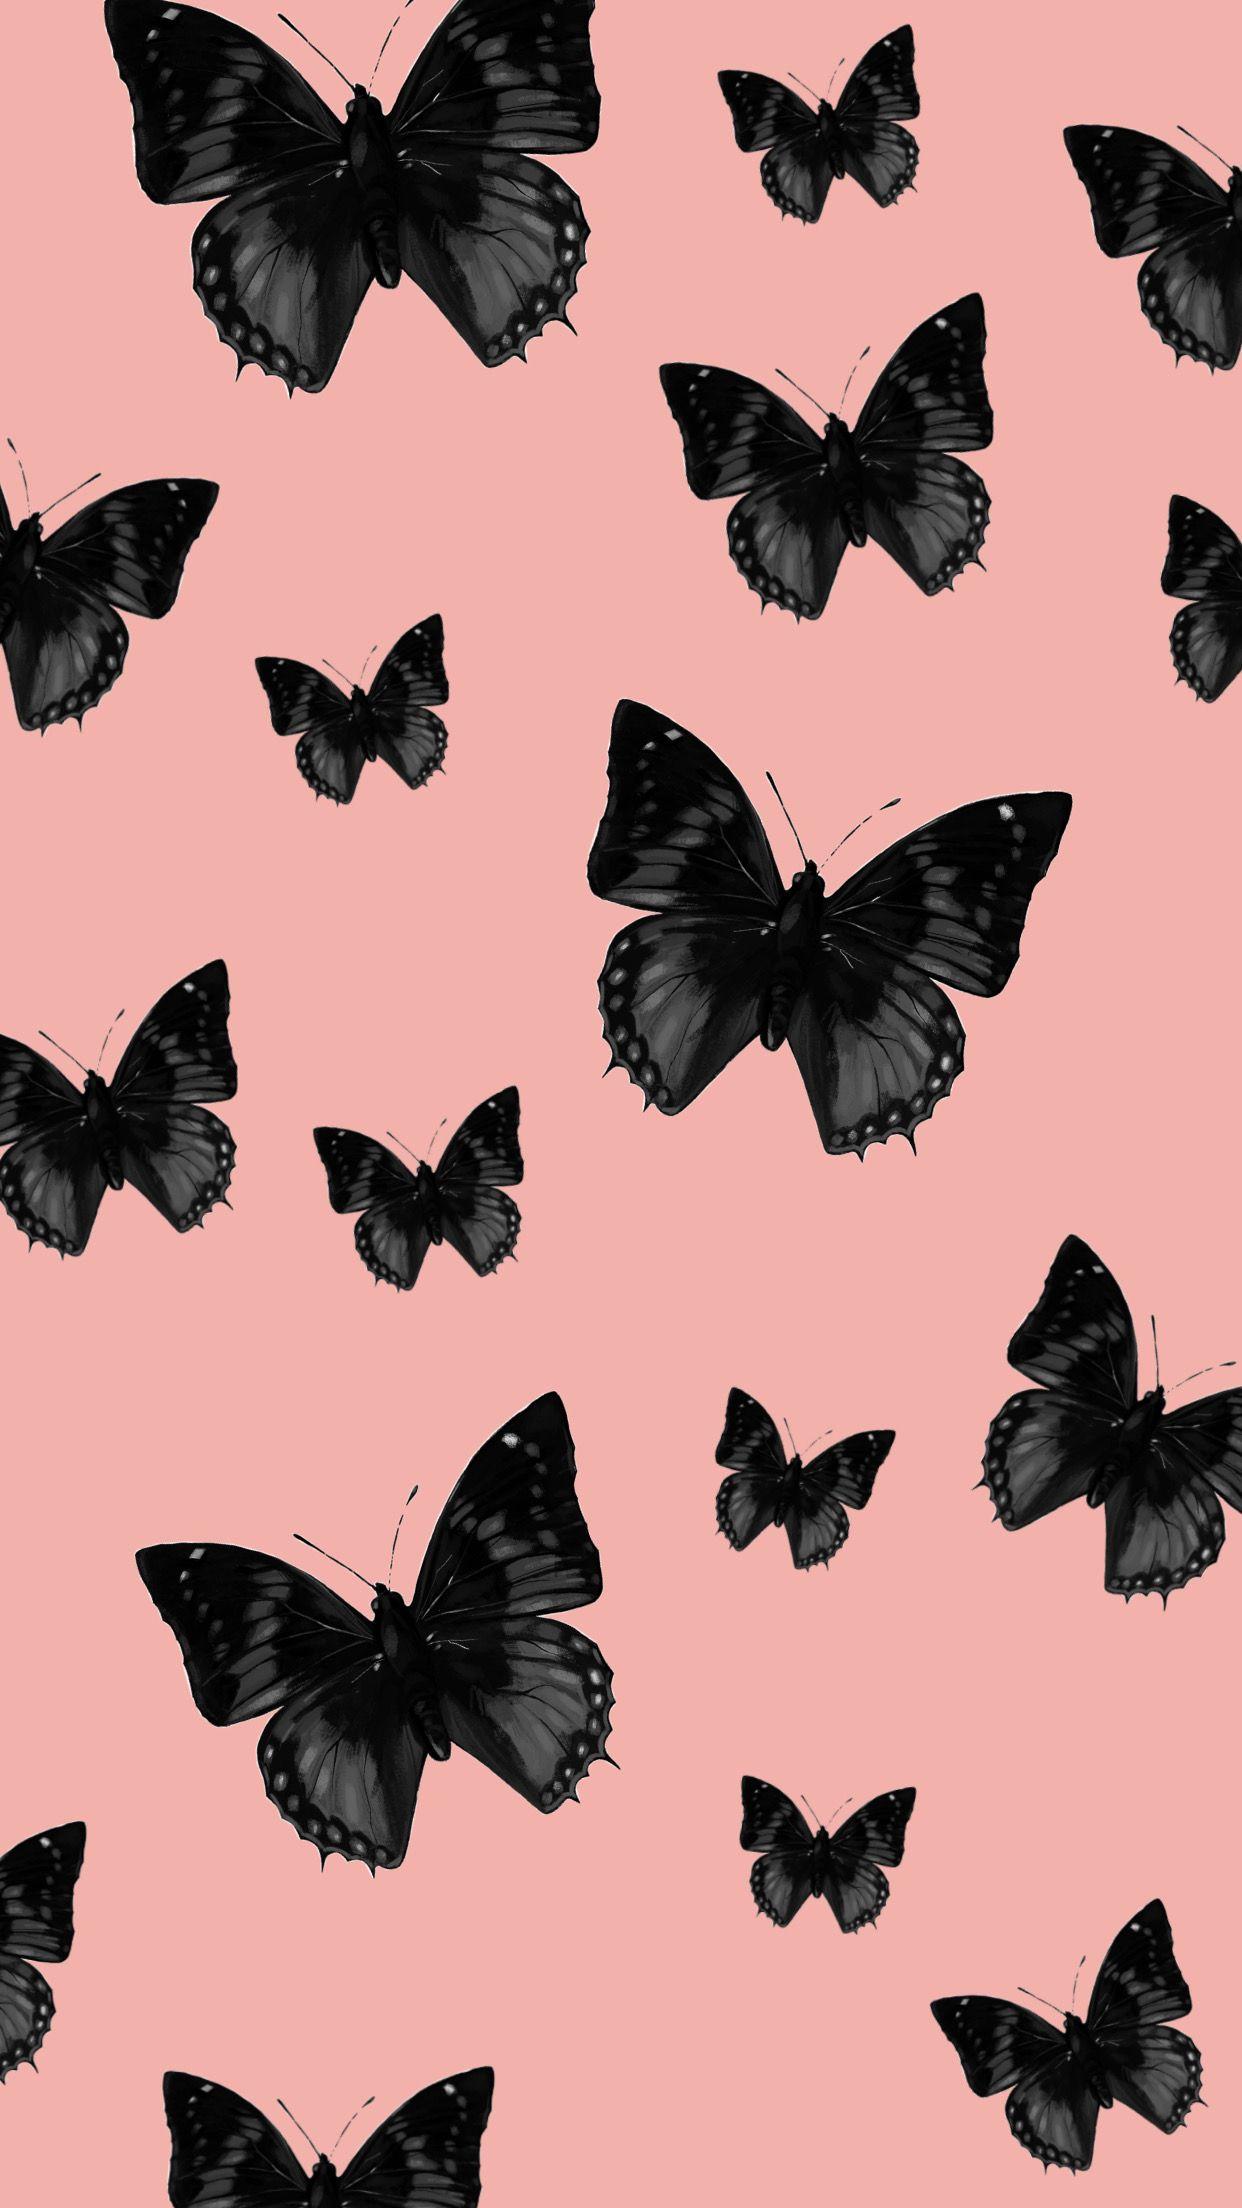 Black Butterflies Wallpaper Butterfly Wallpaper Beautiful Wallpapers Backgrounds Iphone Background Wallpaper